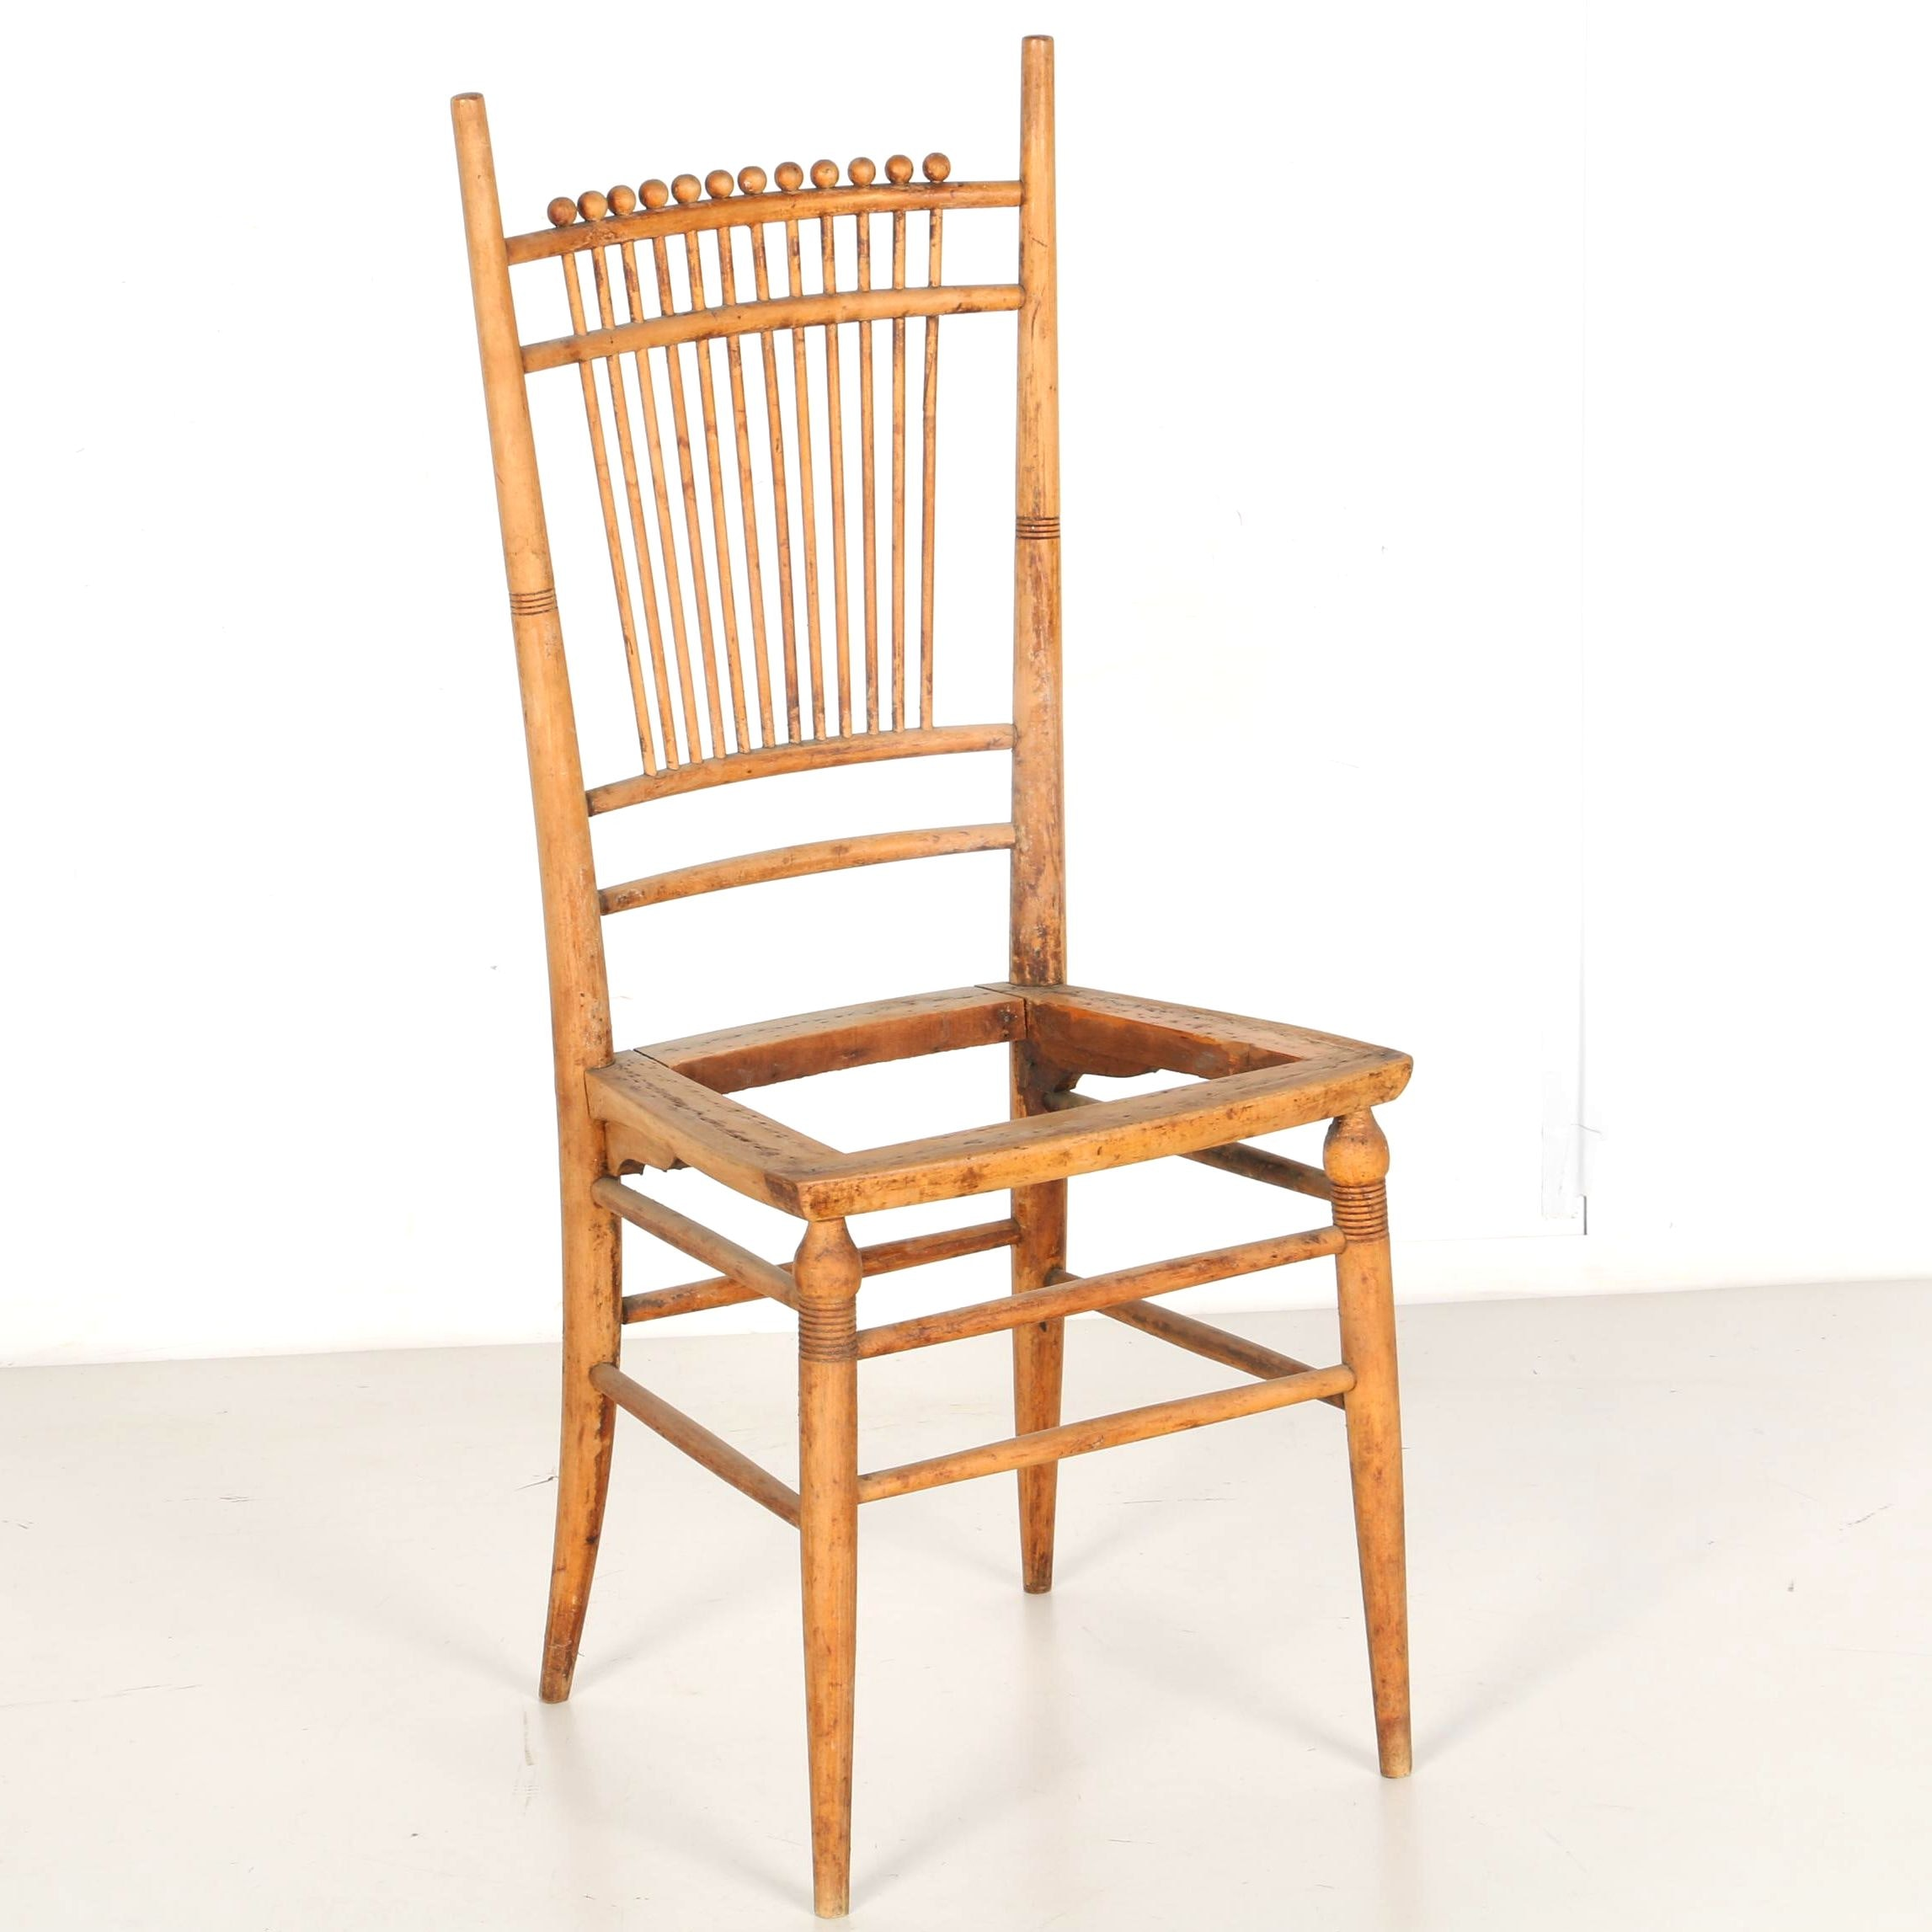 Antique Marble & Shattuck Wood Chair Frame